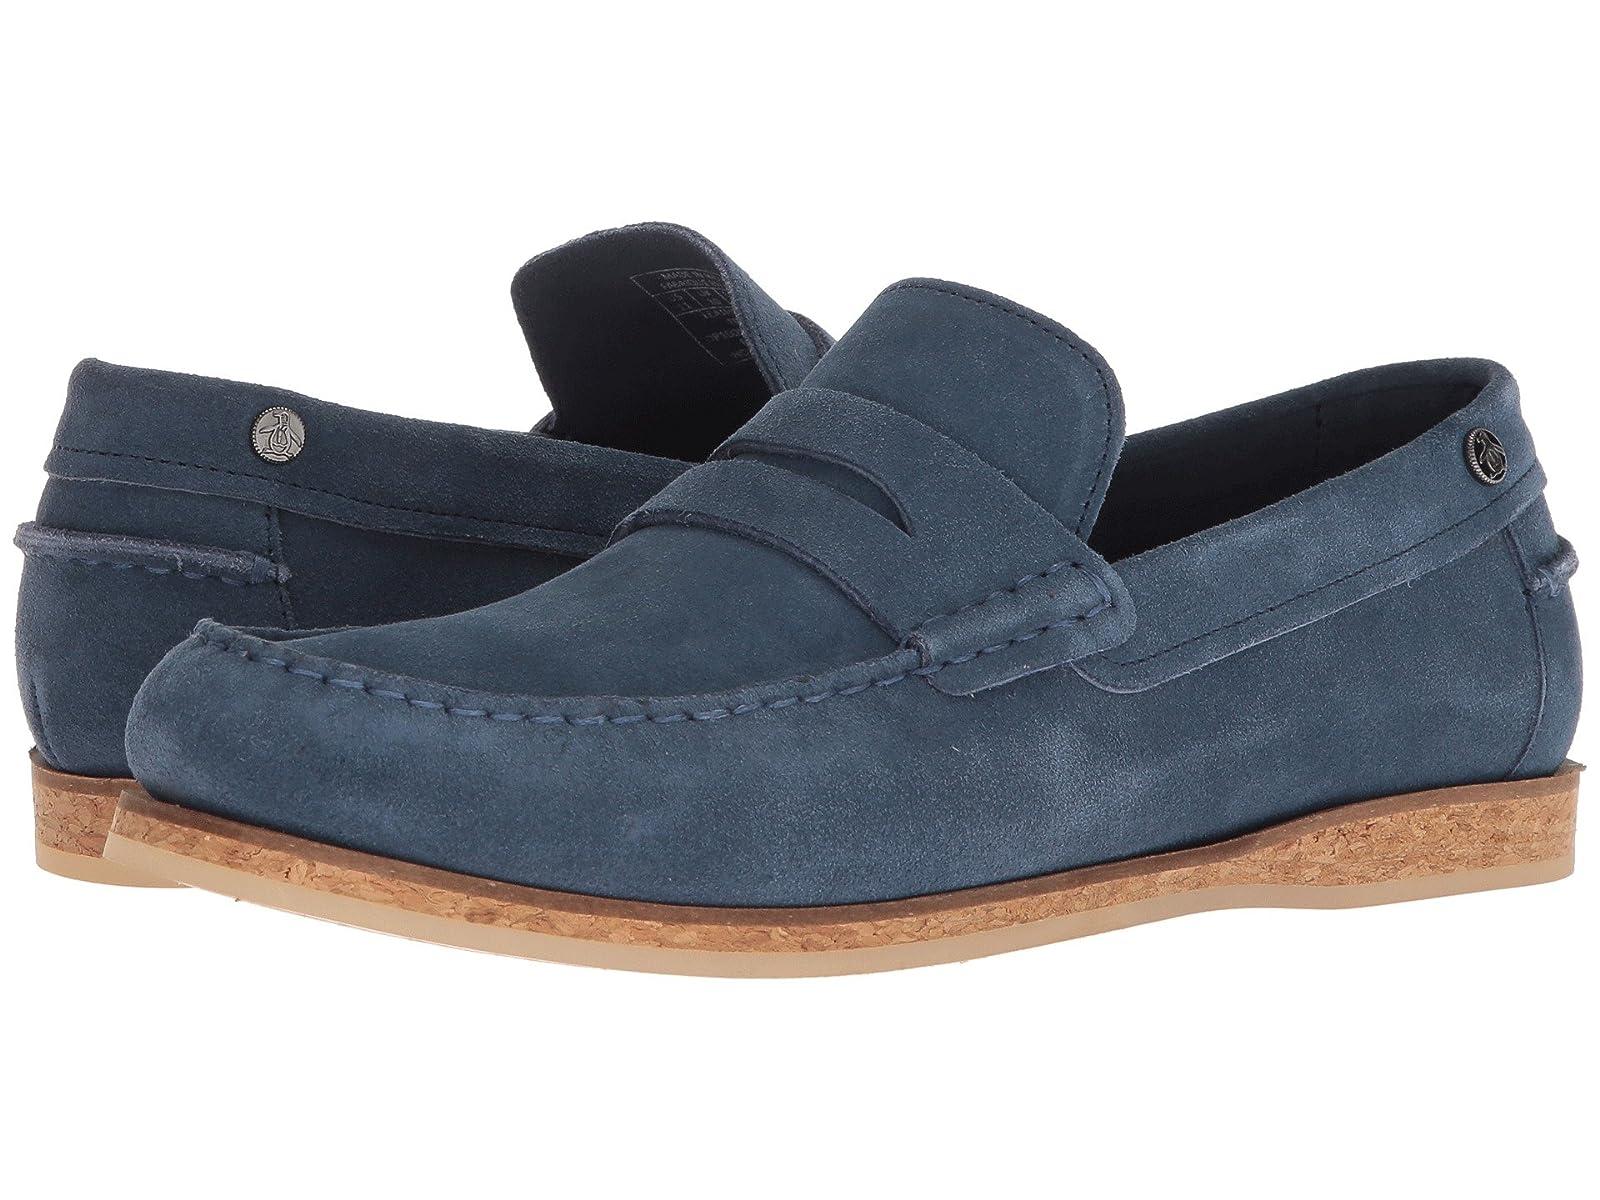 Original Penguin Charles 2Atmospheric grades have affordable shoes